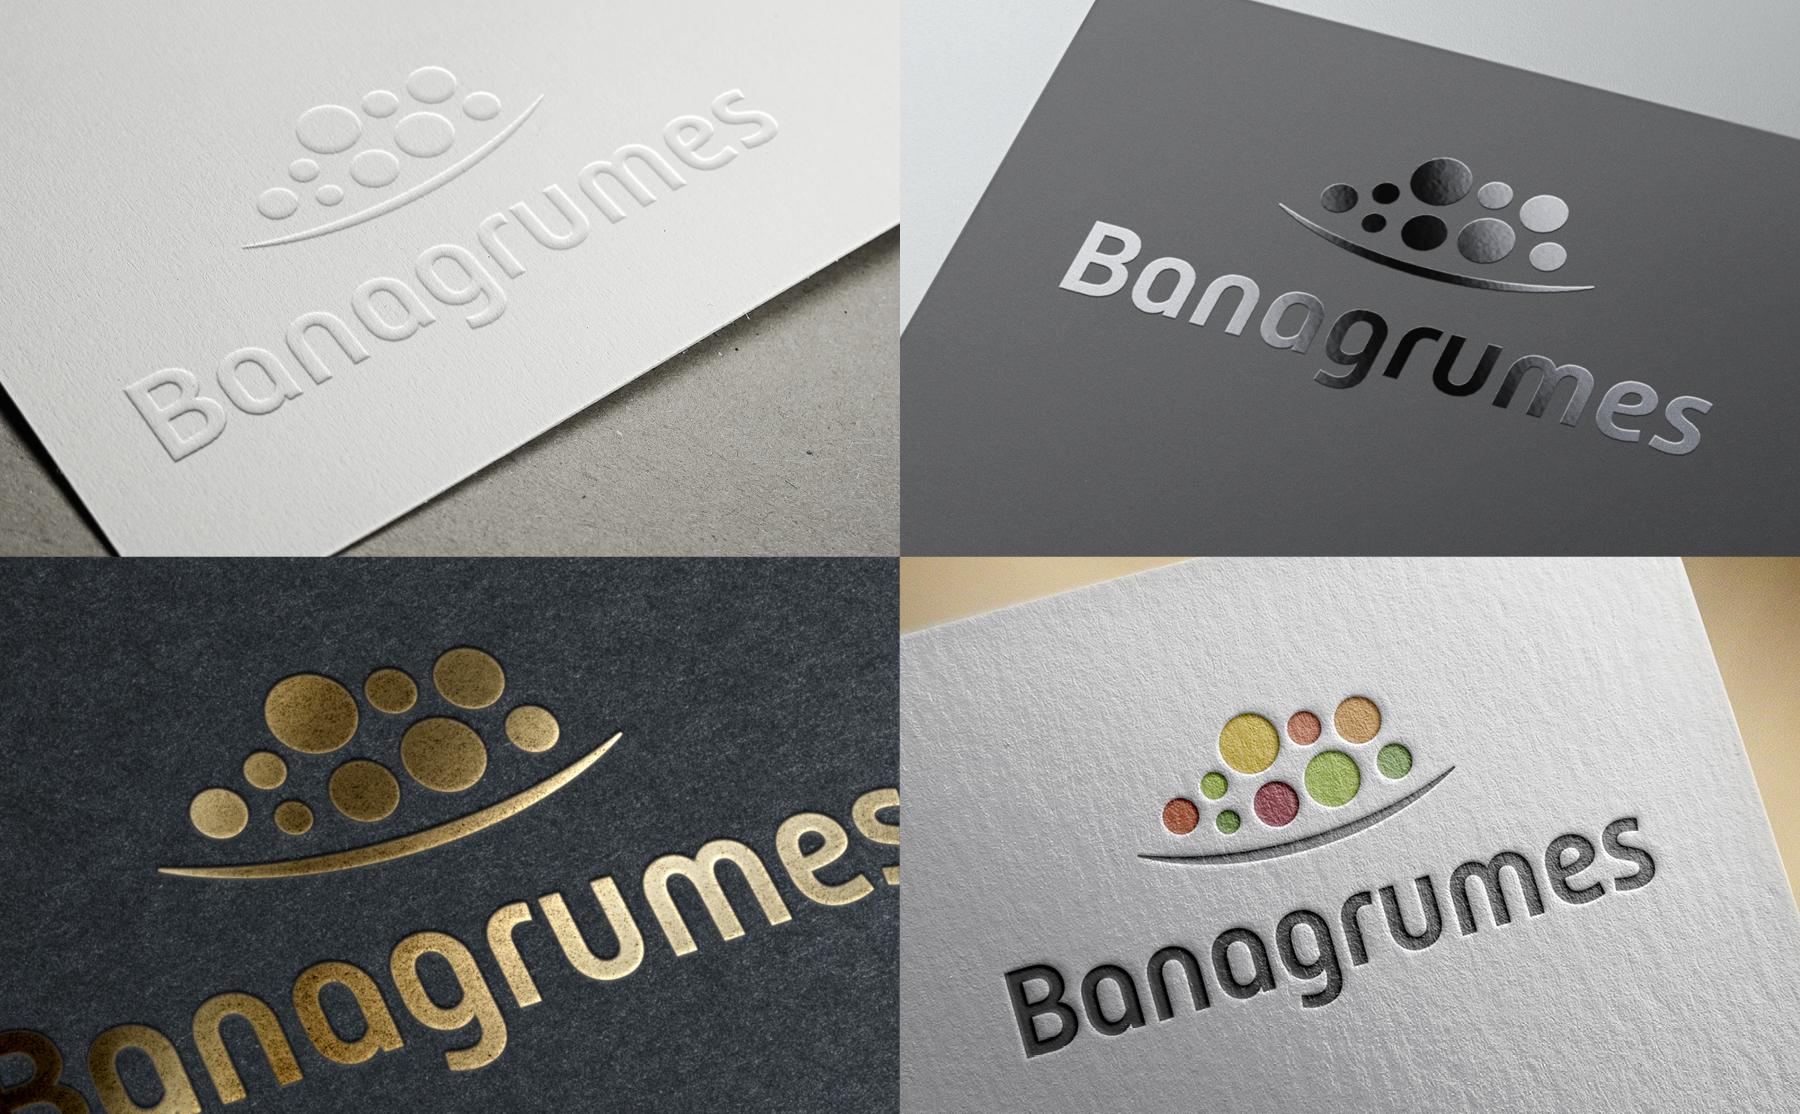 Variations couleurs logo Banagrumes